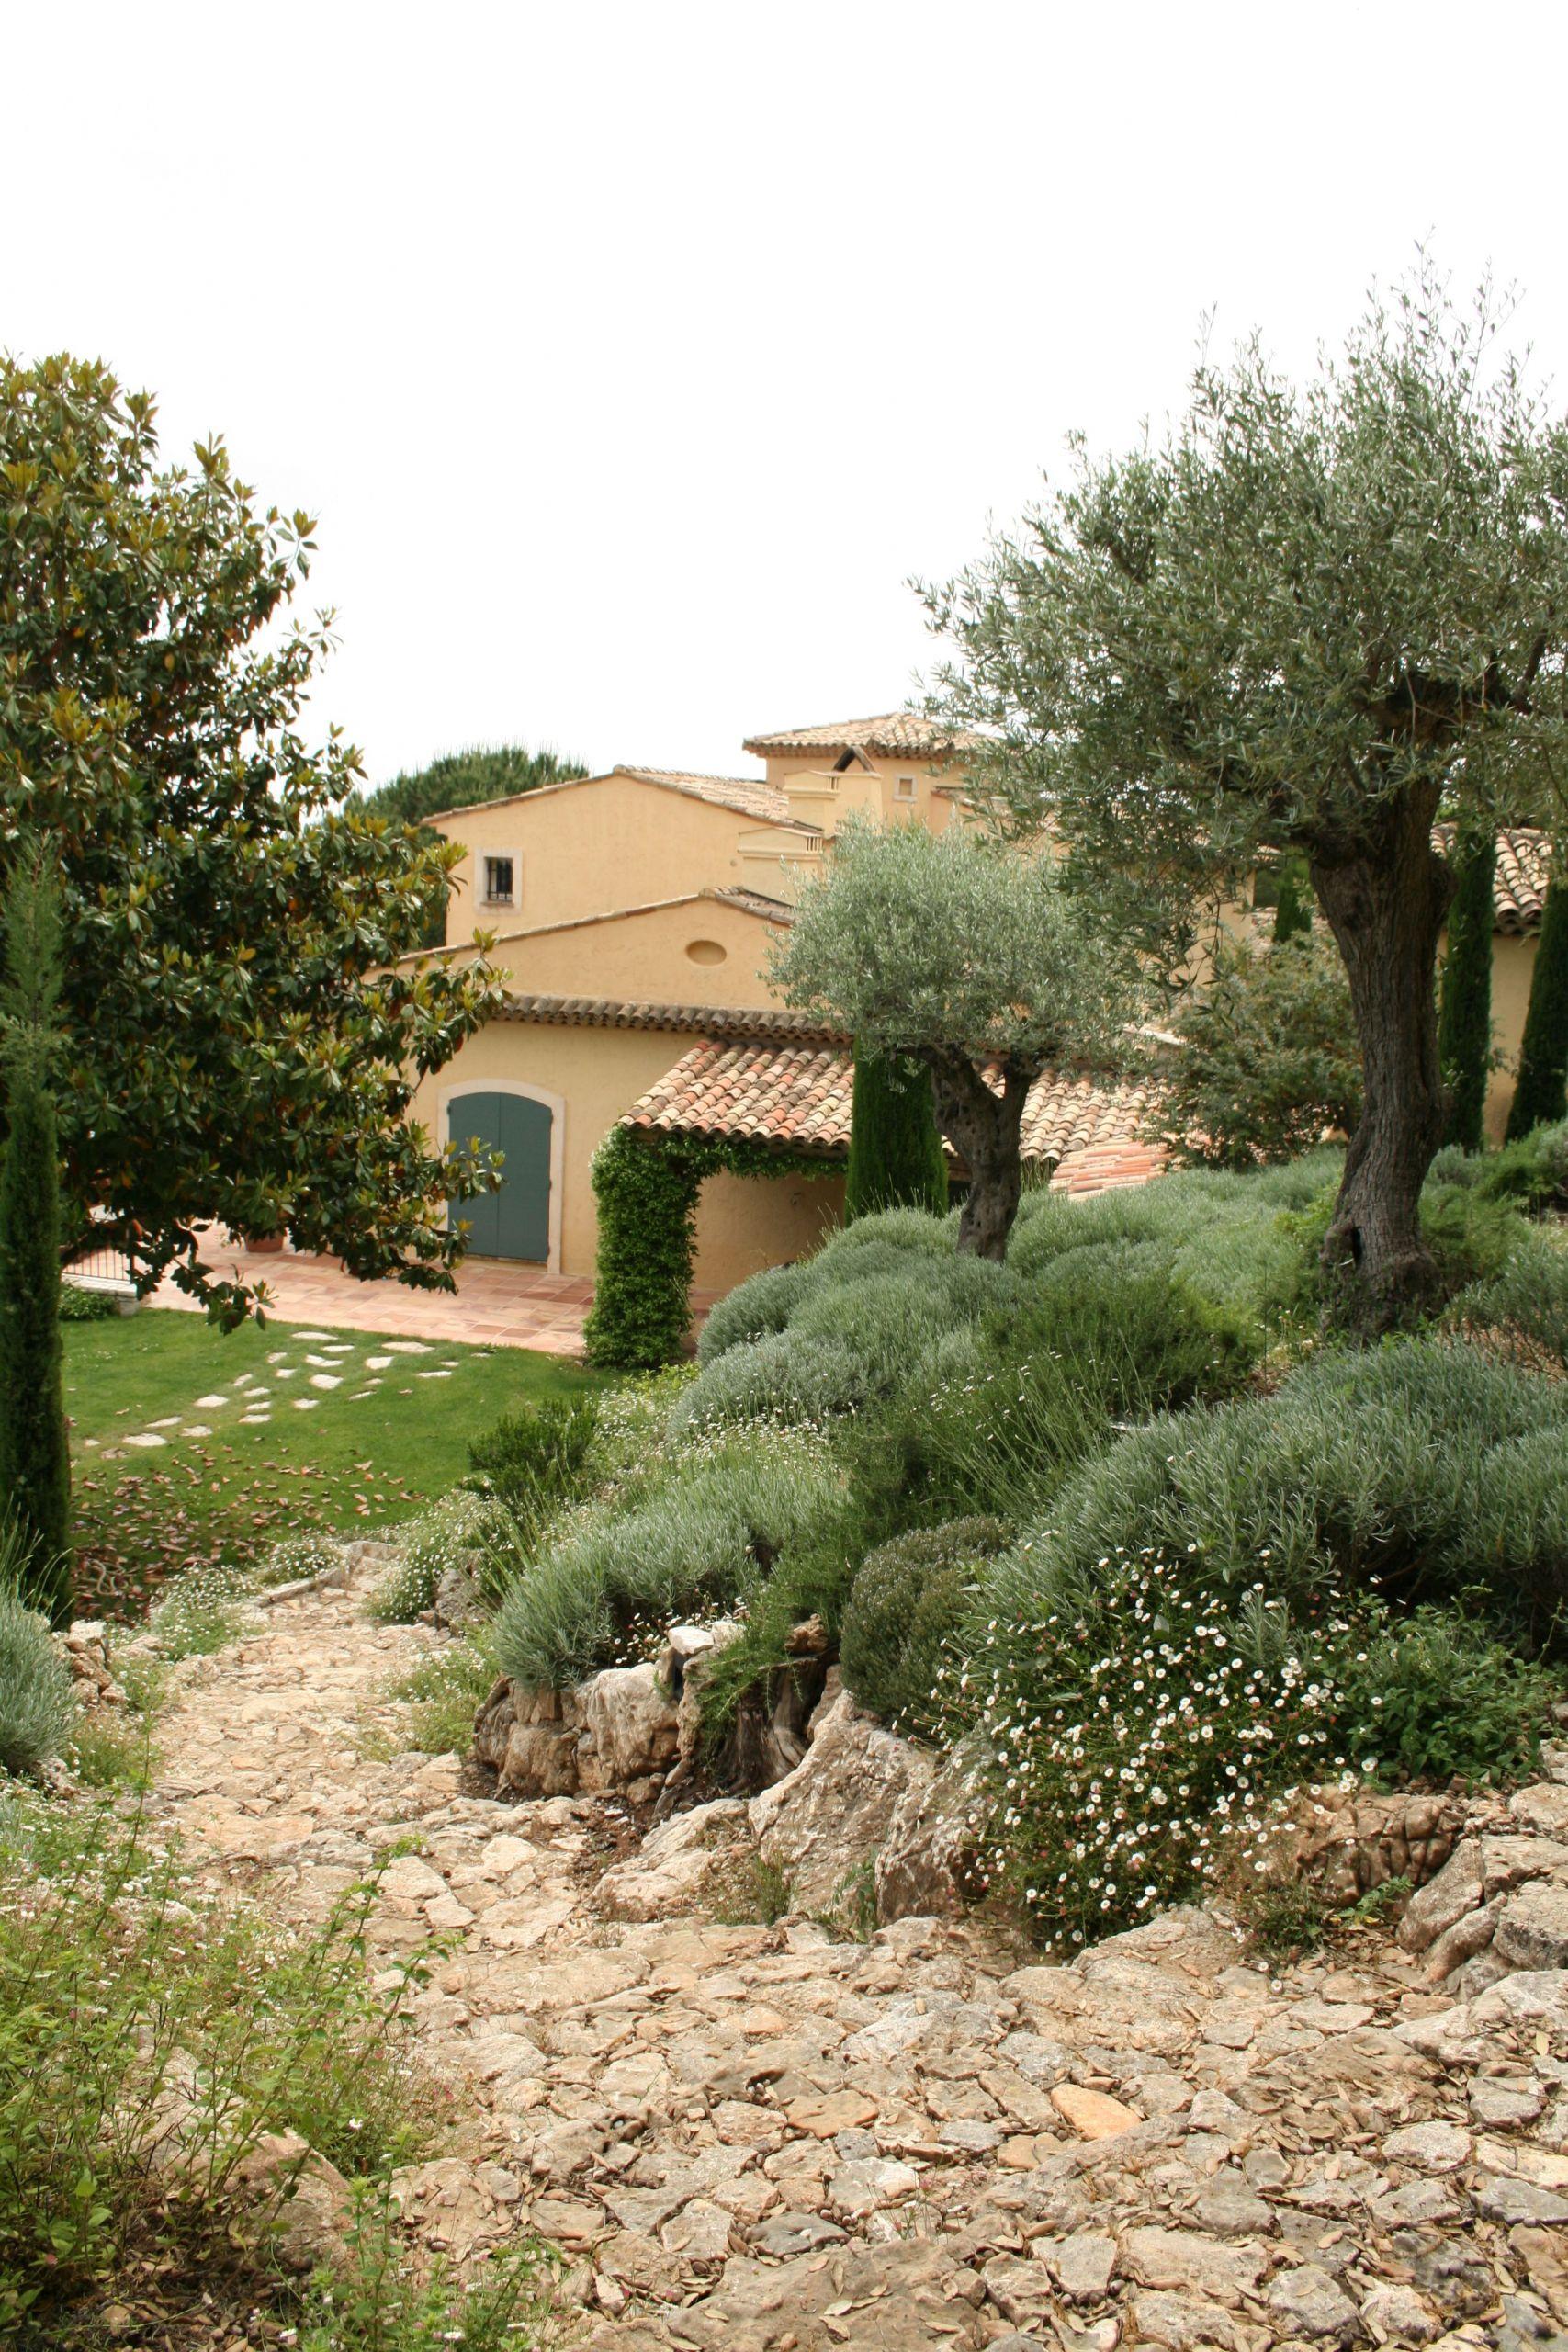 Massif Paysager Luxe Jean Mus Garden In Saint Paul De Vence